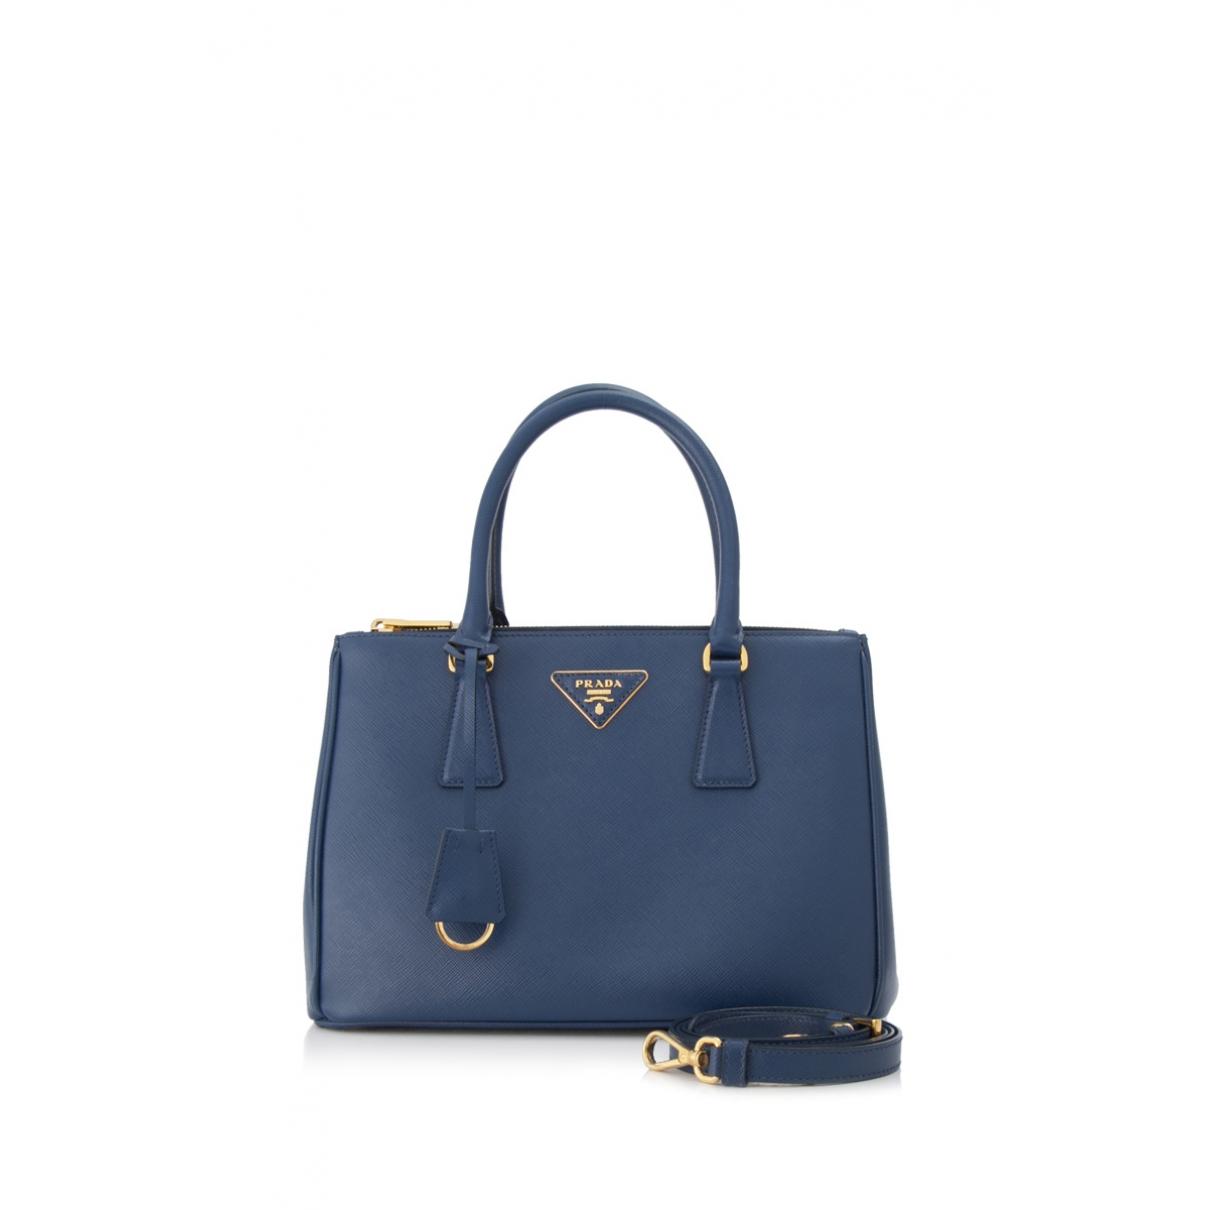 Prada Galleria Blue Leather handbag for Women \N